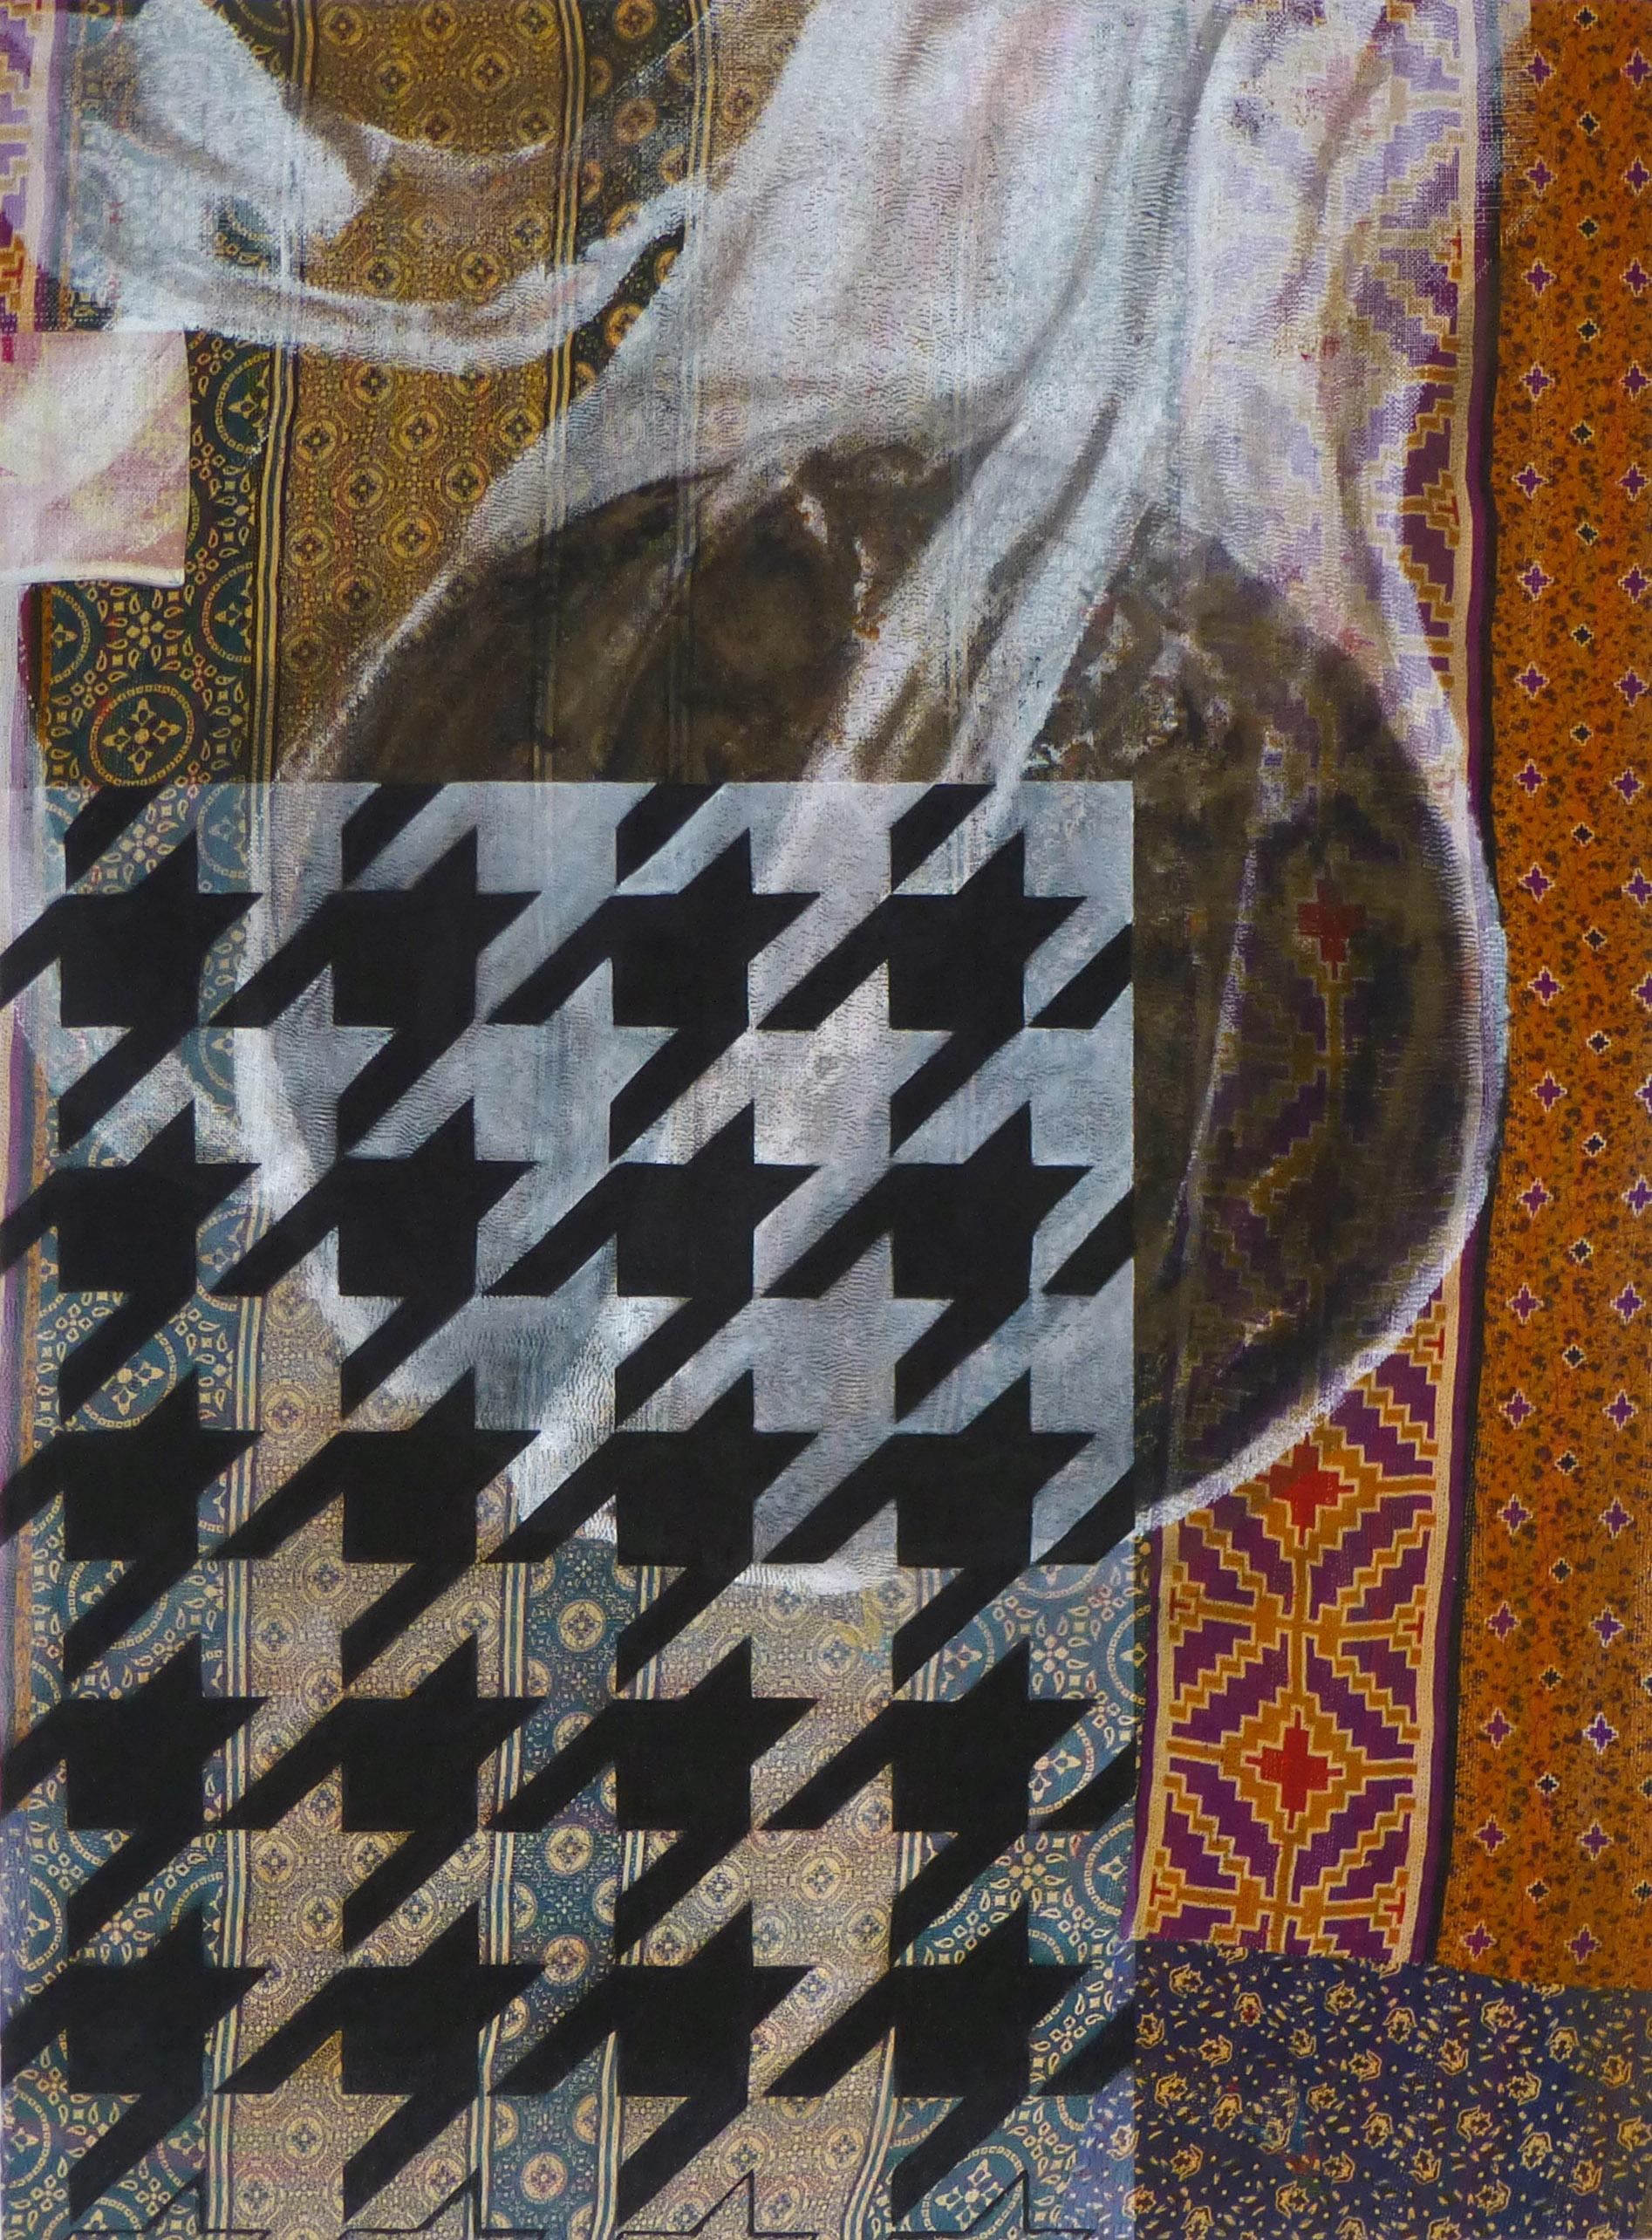 Shezad Dawood   Burning Sun , 2012 Acrylic on Vintage textile 61.81 x 45.67 inches 157 x 116 cm